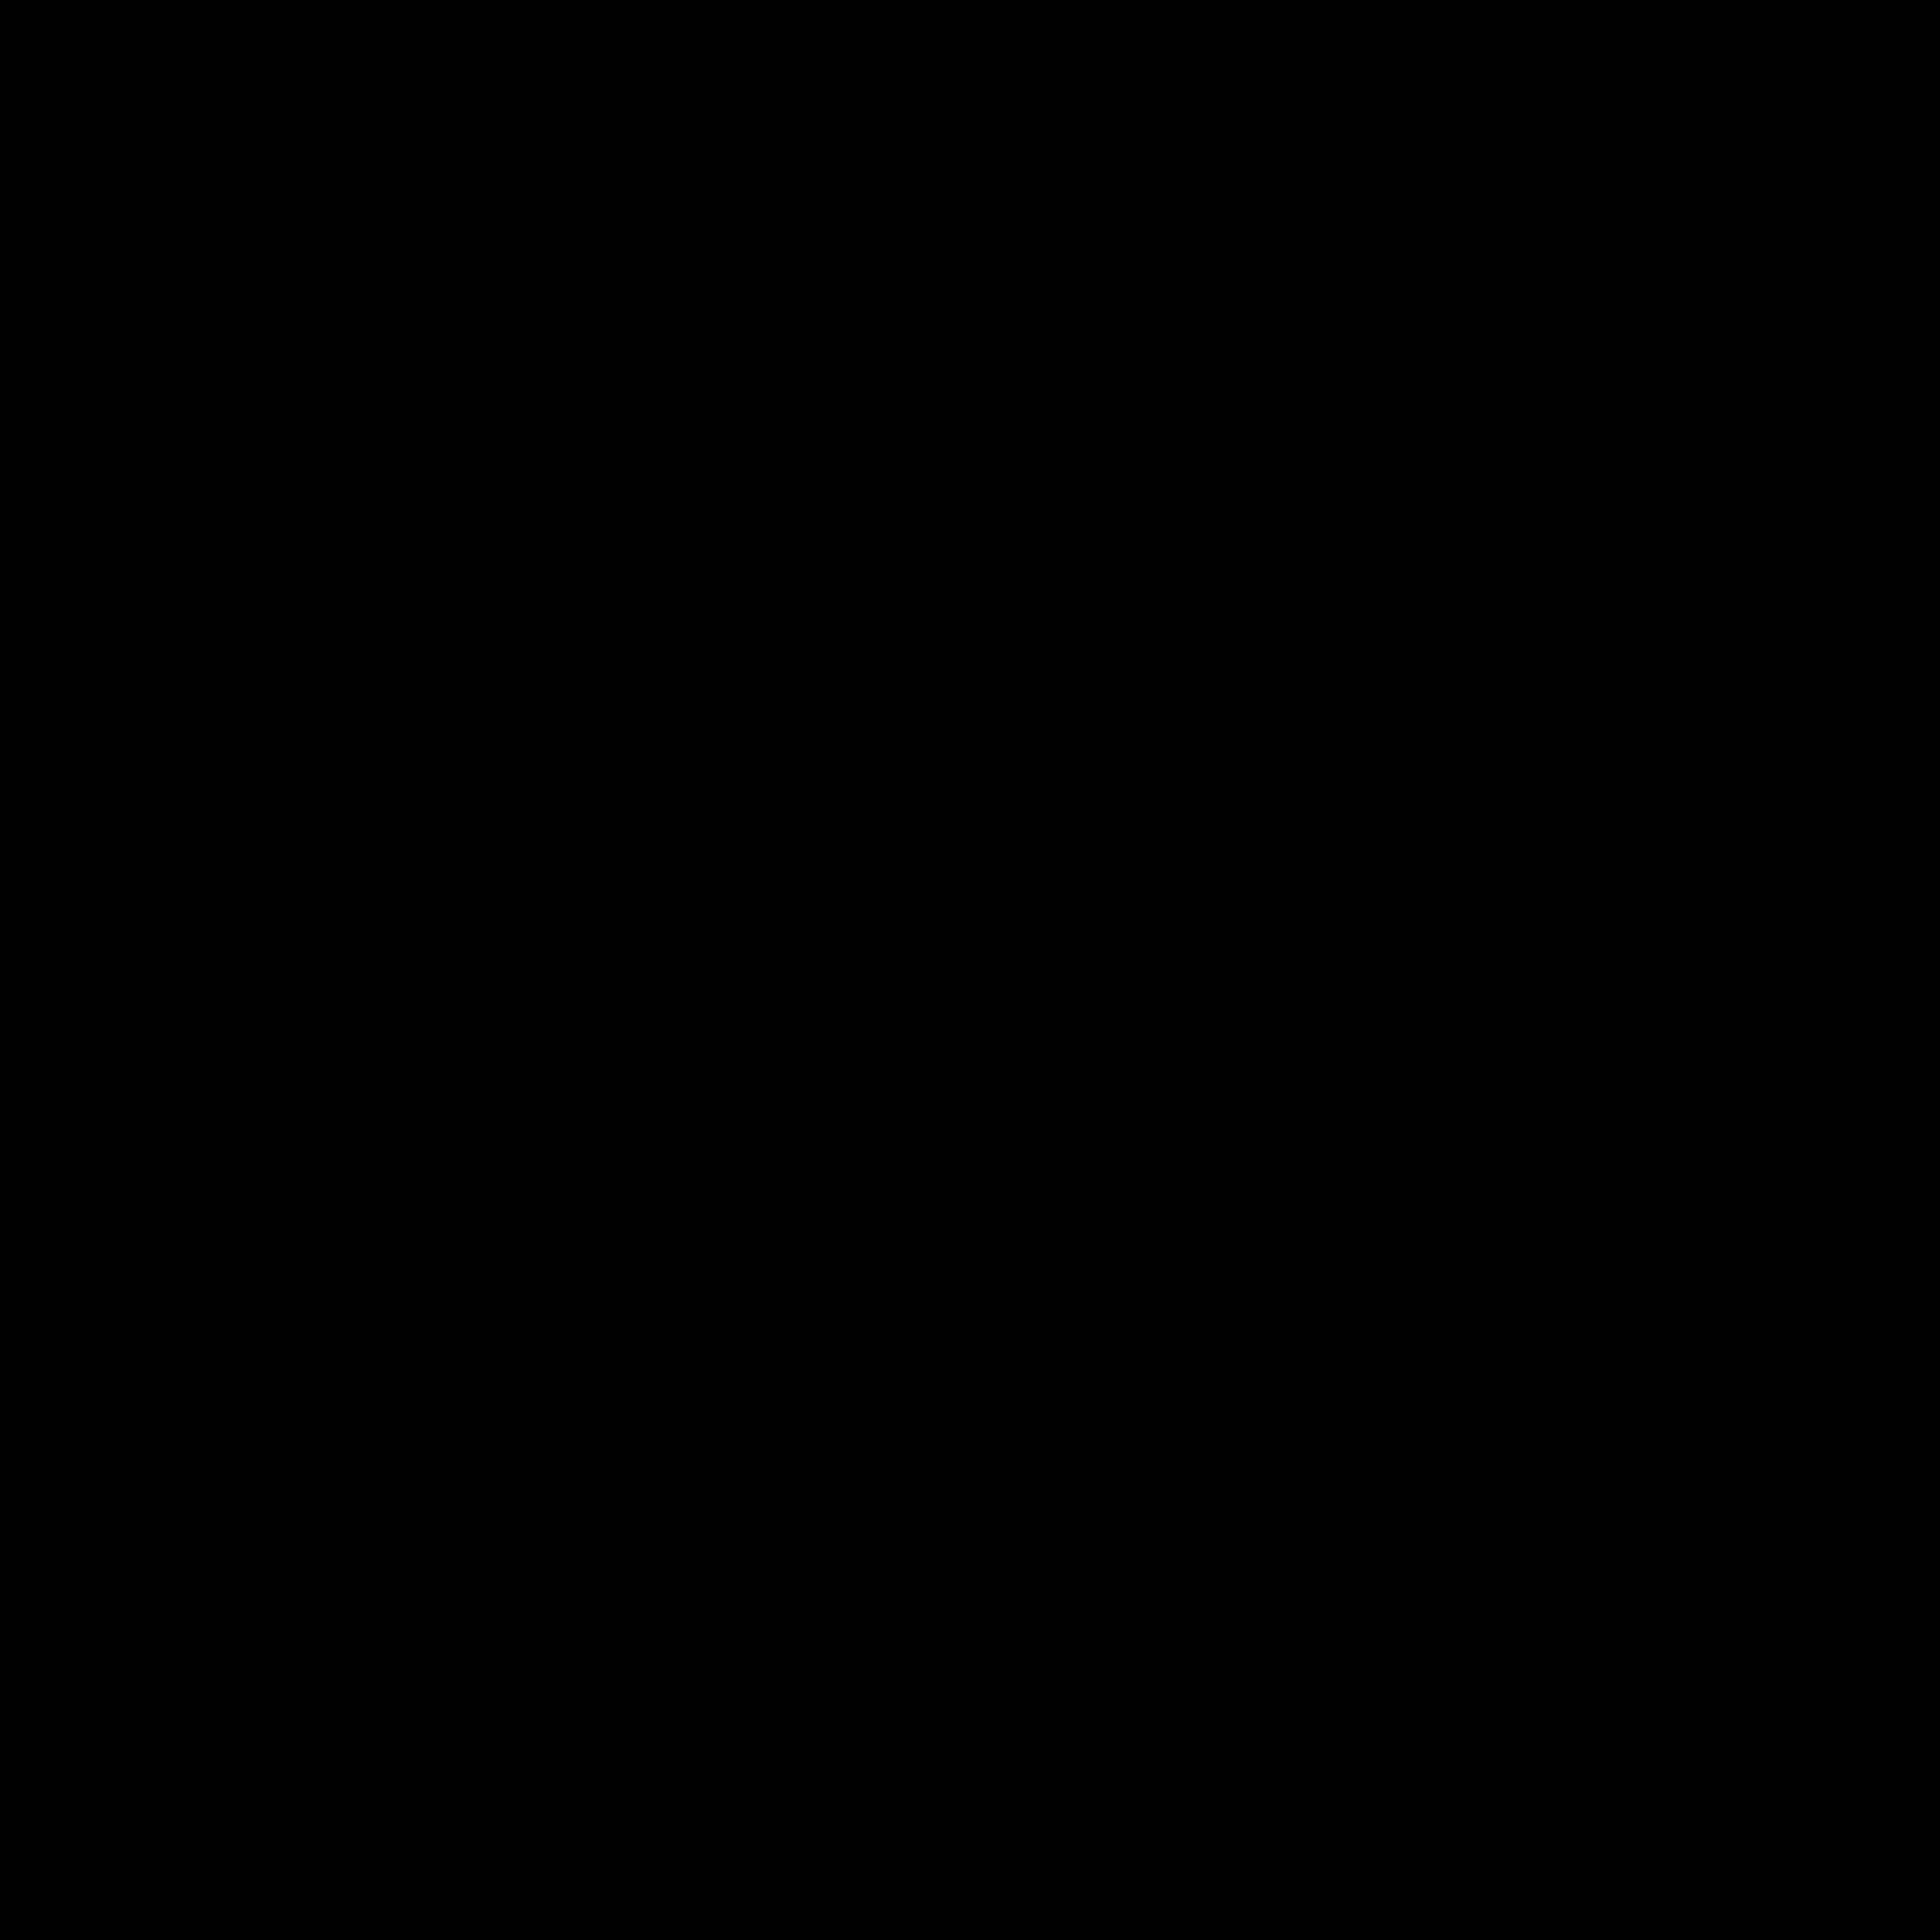 Clairol 1209 Logo PNG Transparent & SVG Vector.